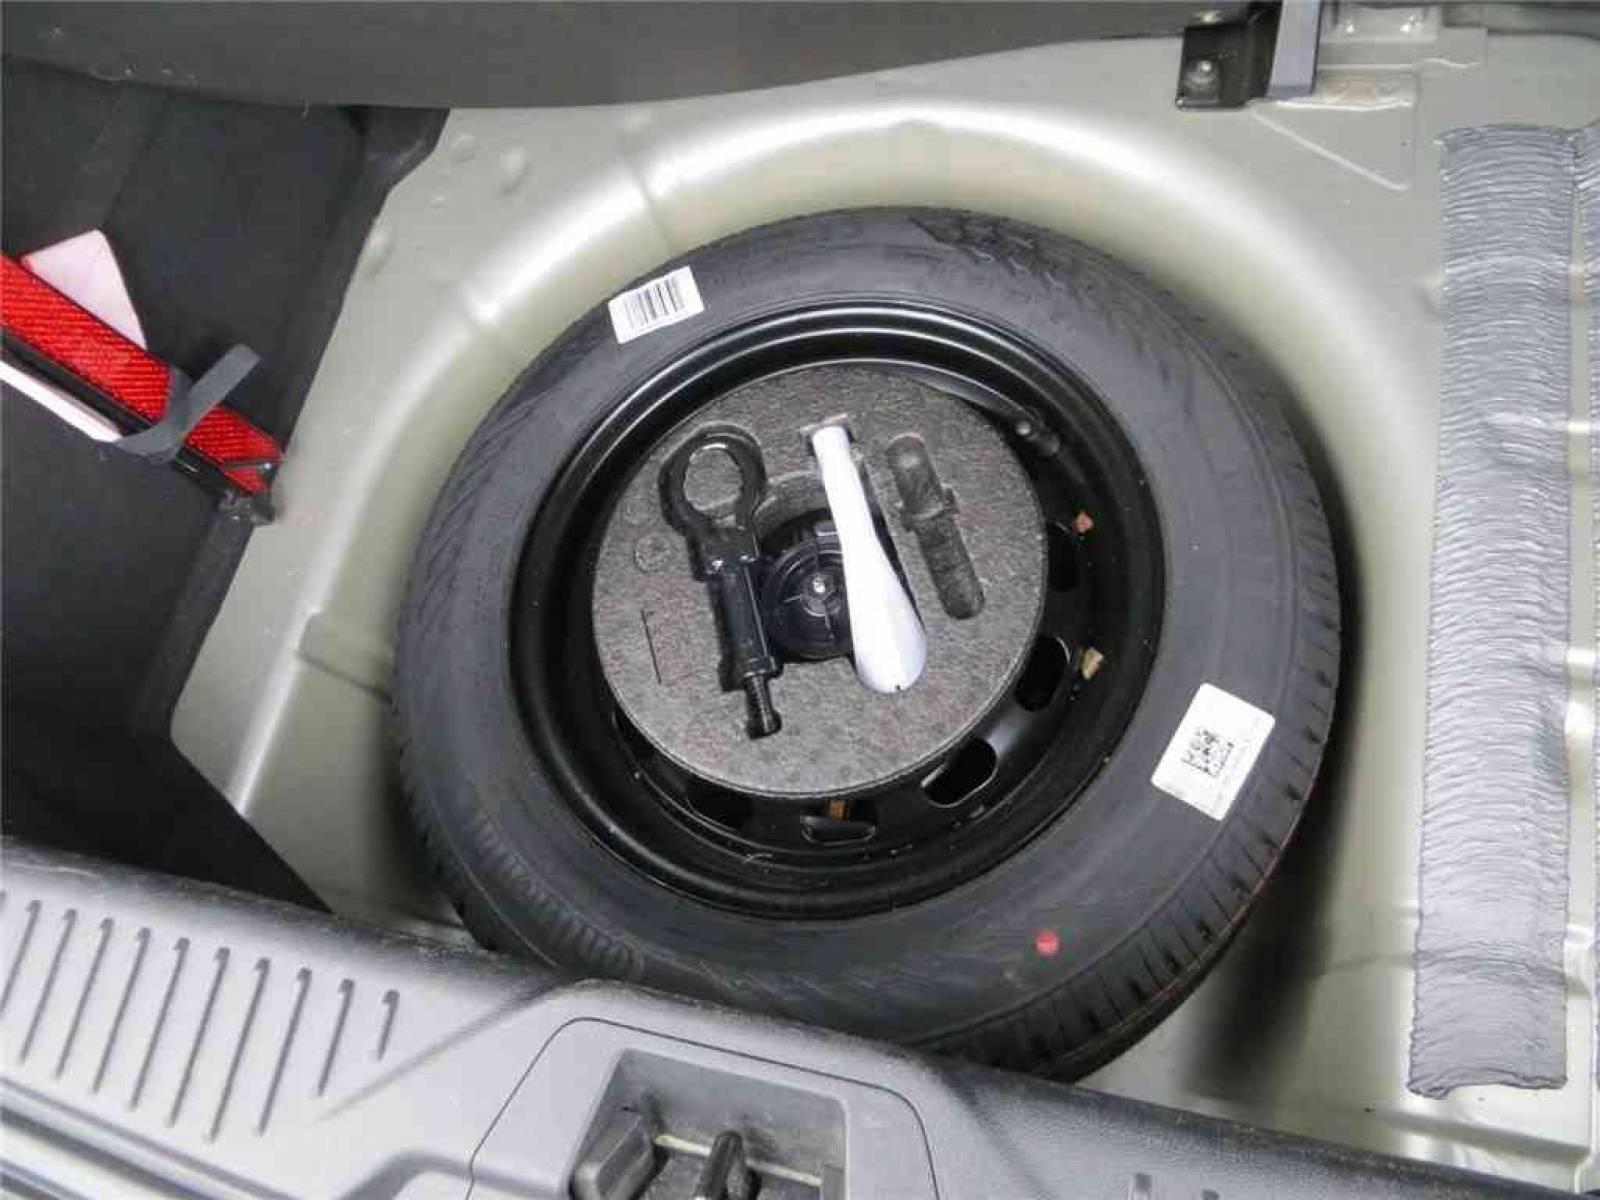 FORD Fiesta 1.0 EcoBoost 100 ch S&S BVM6 - véhicule d'occasion - Groupe Guillet - Opel Magicauto - Chalon-sur-Saône - 71380 - Saint-Marcel - 8